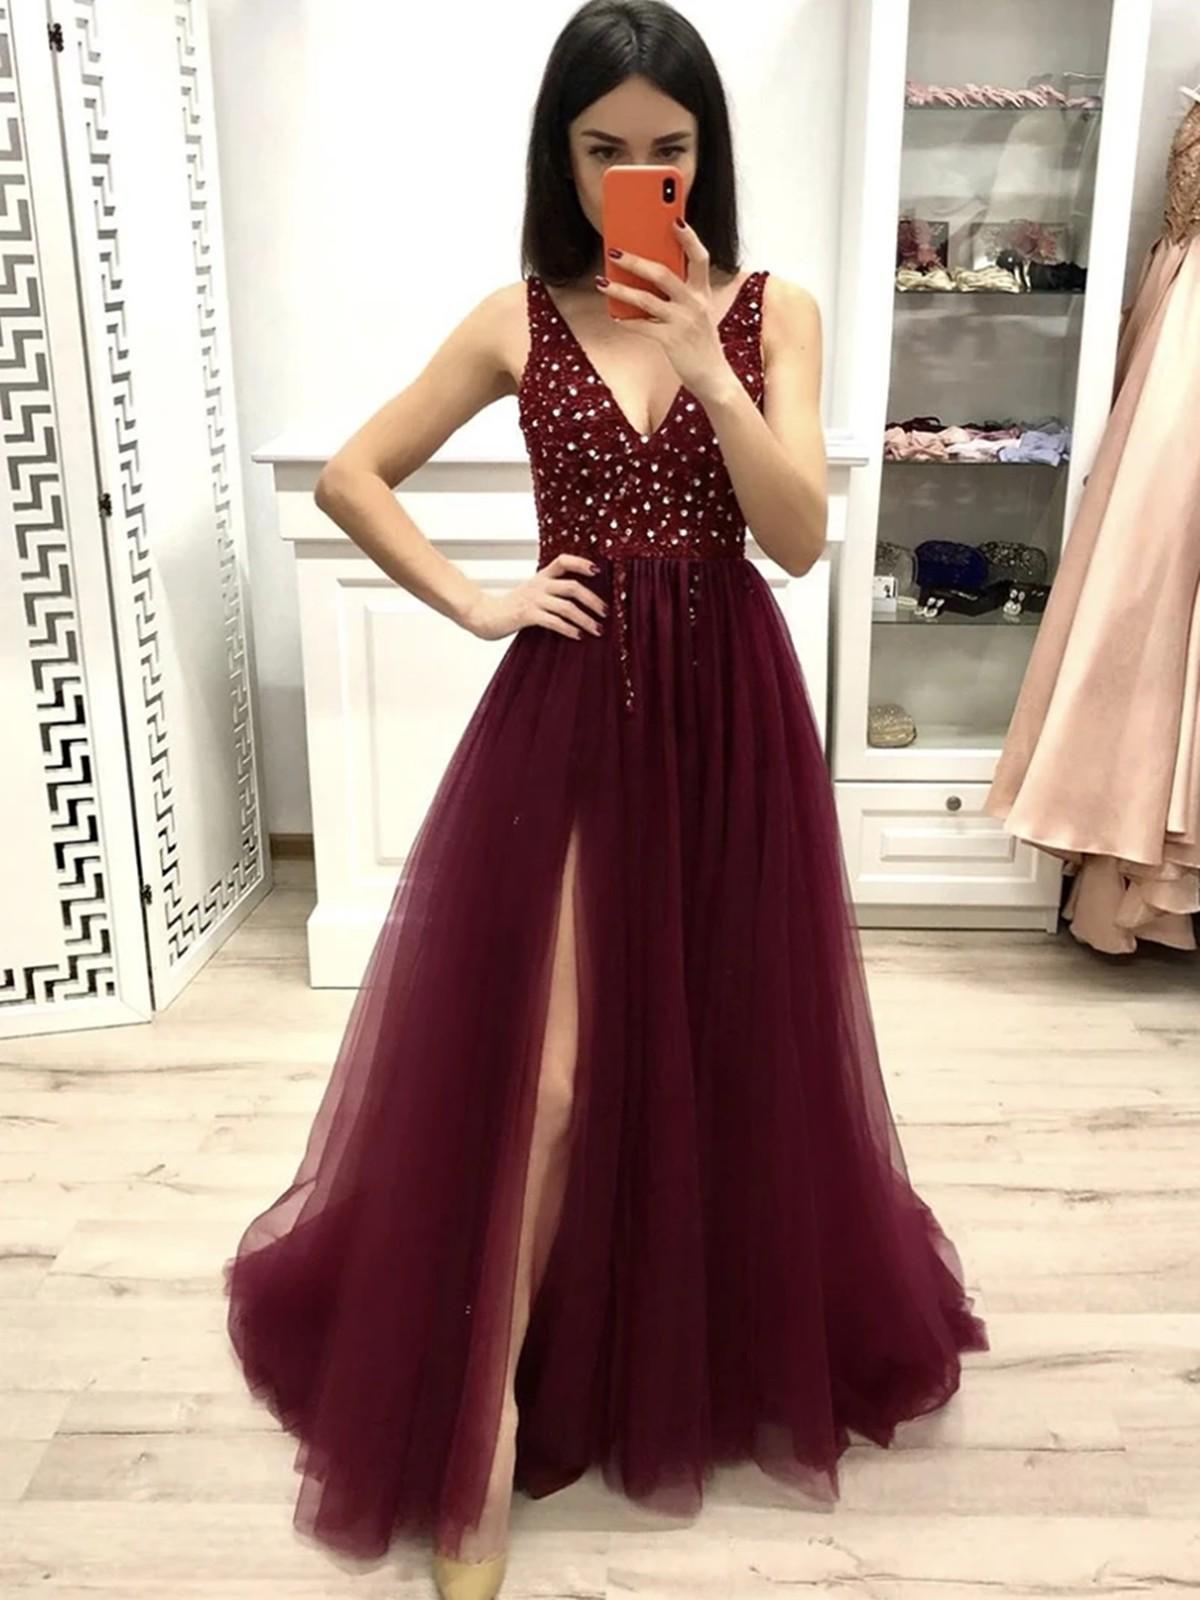 Attire prom dresses burgundy bridal party dress, cocktail dress